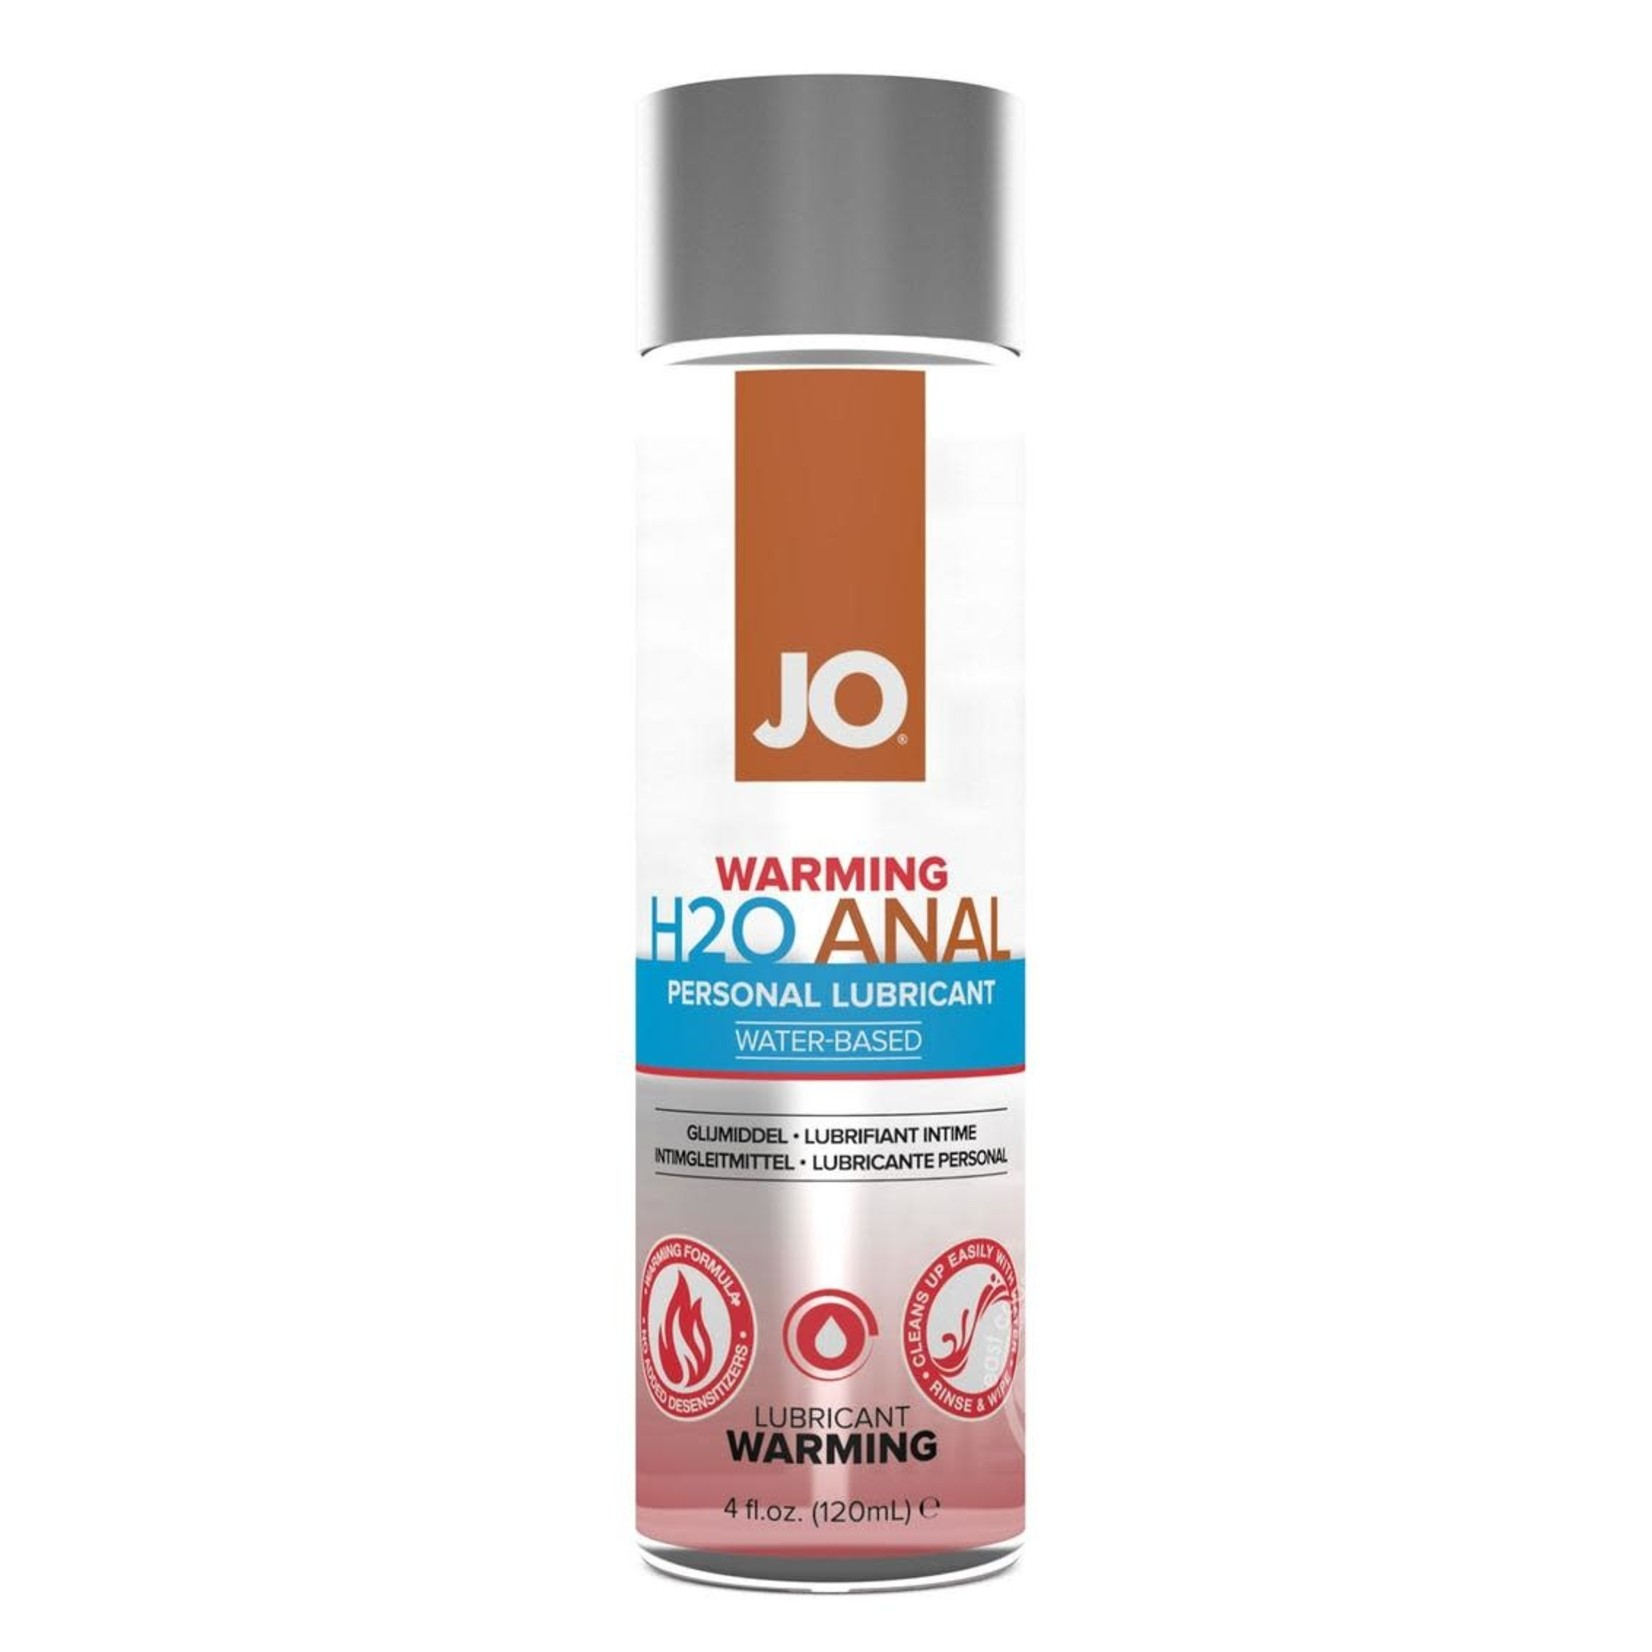 JO H2O Water Based Warming Lubricant 4oz